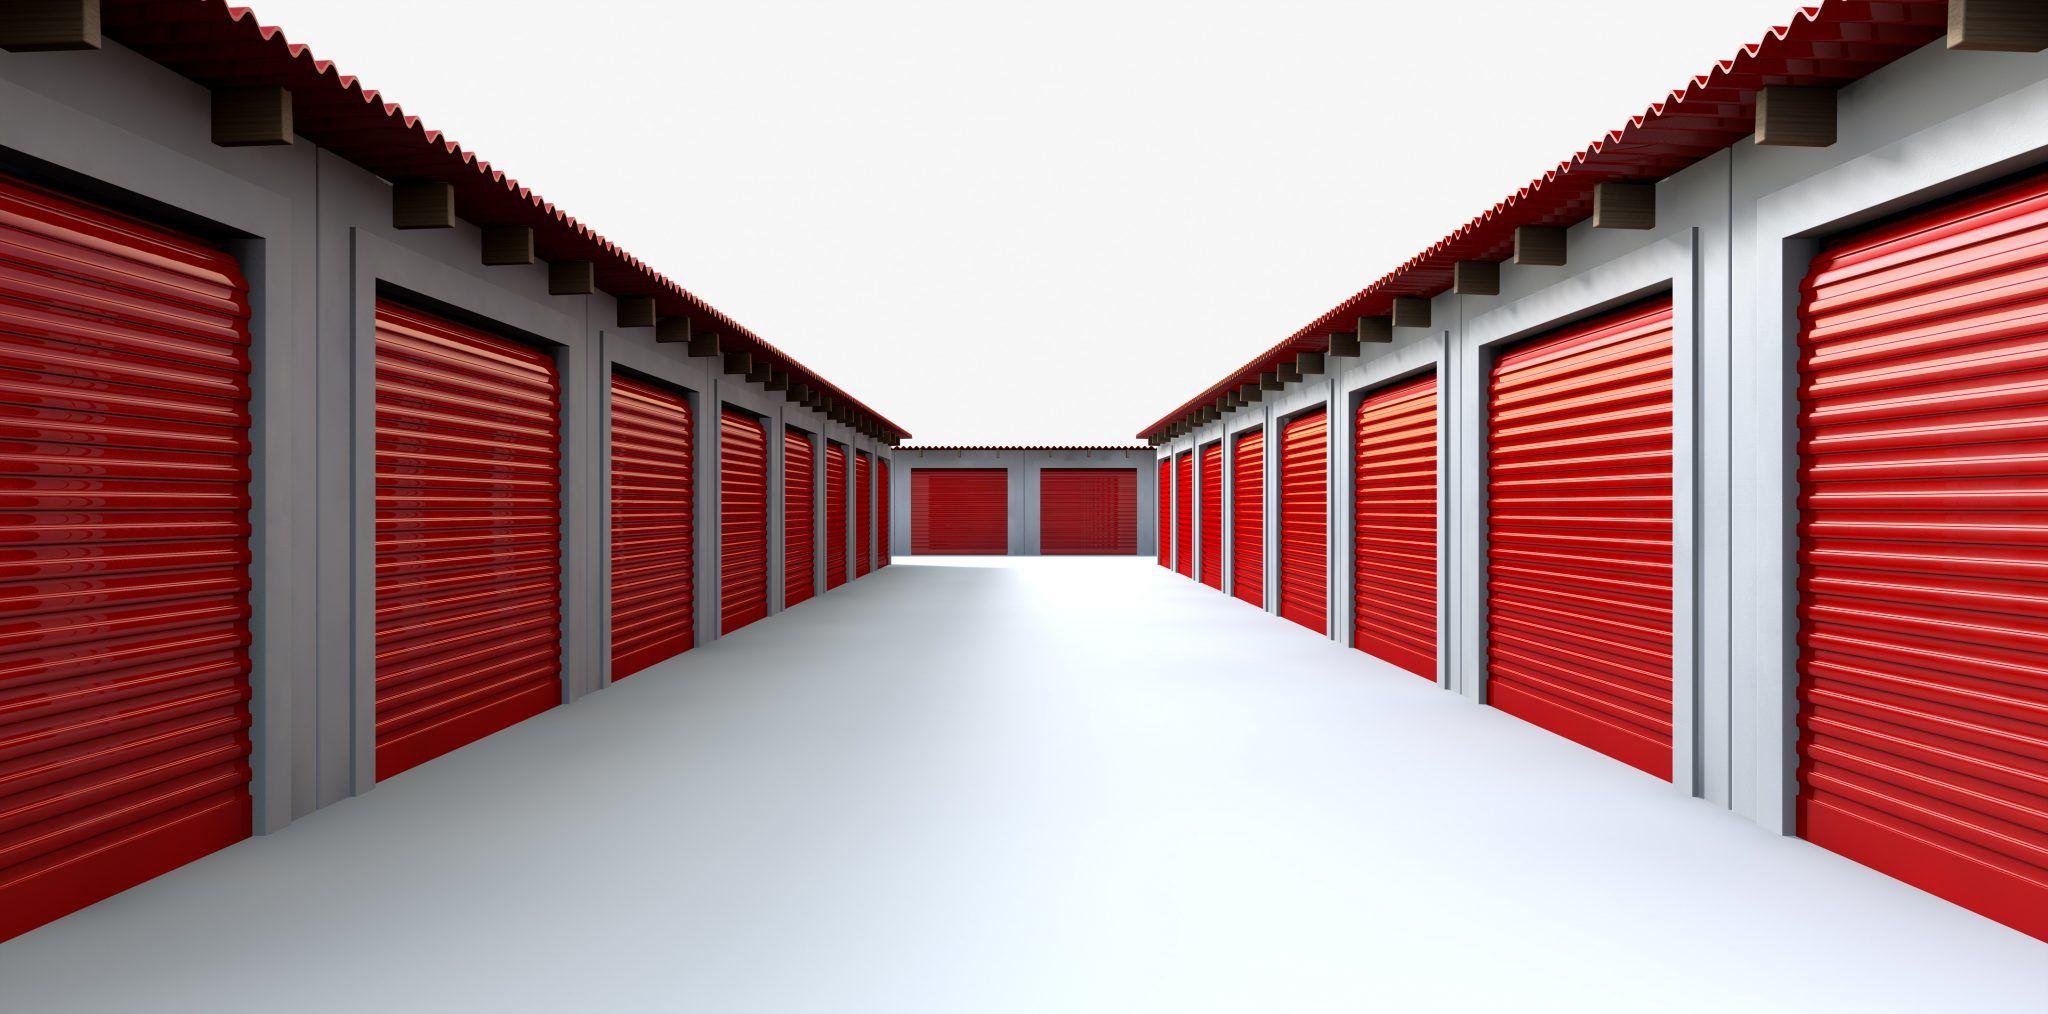 5' x 5' Storage Room